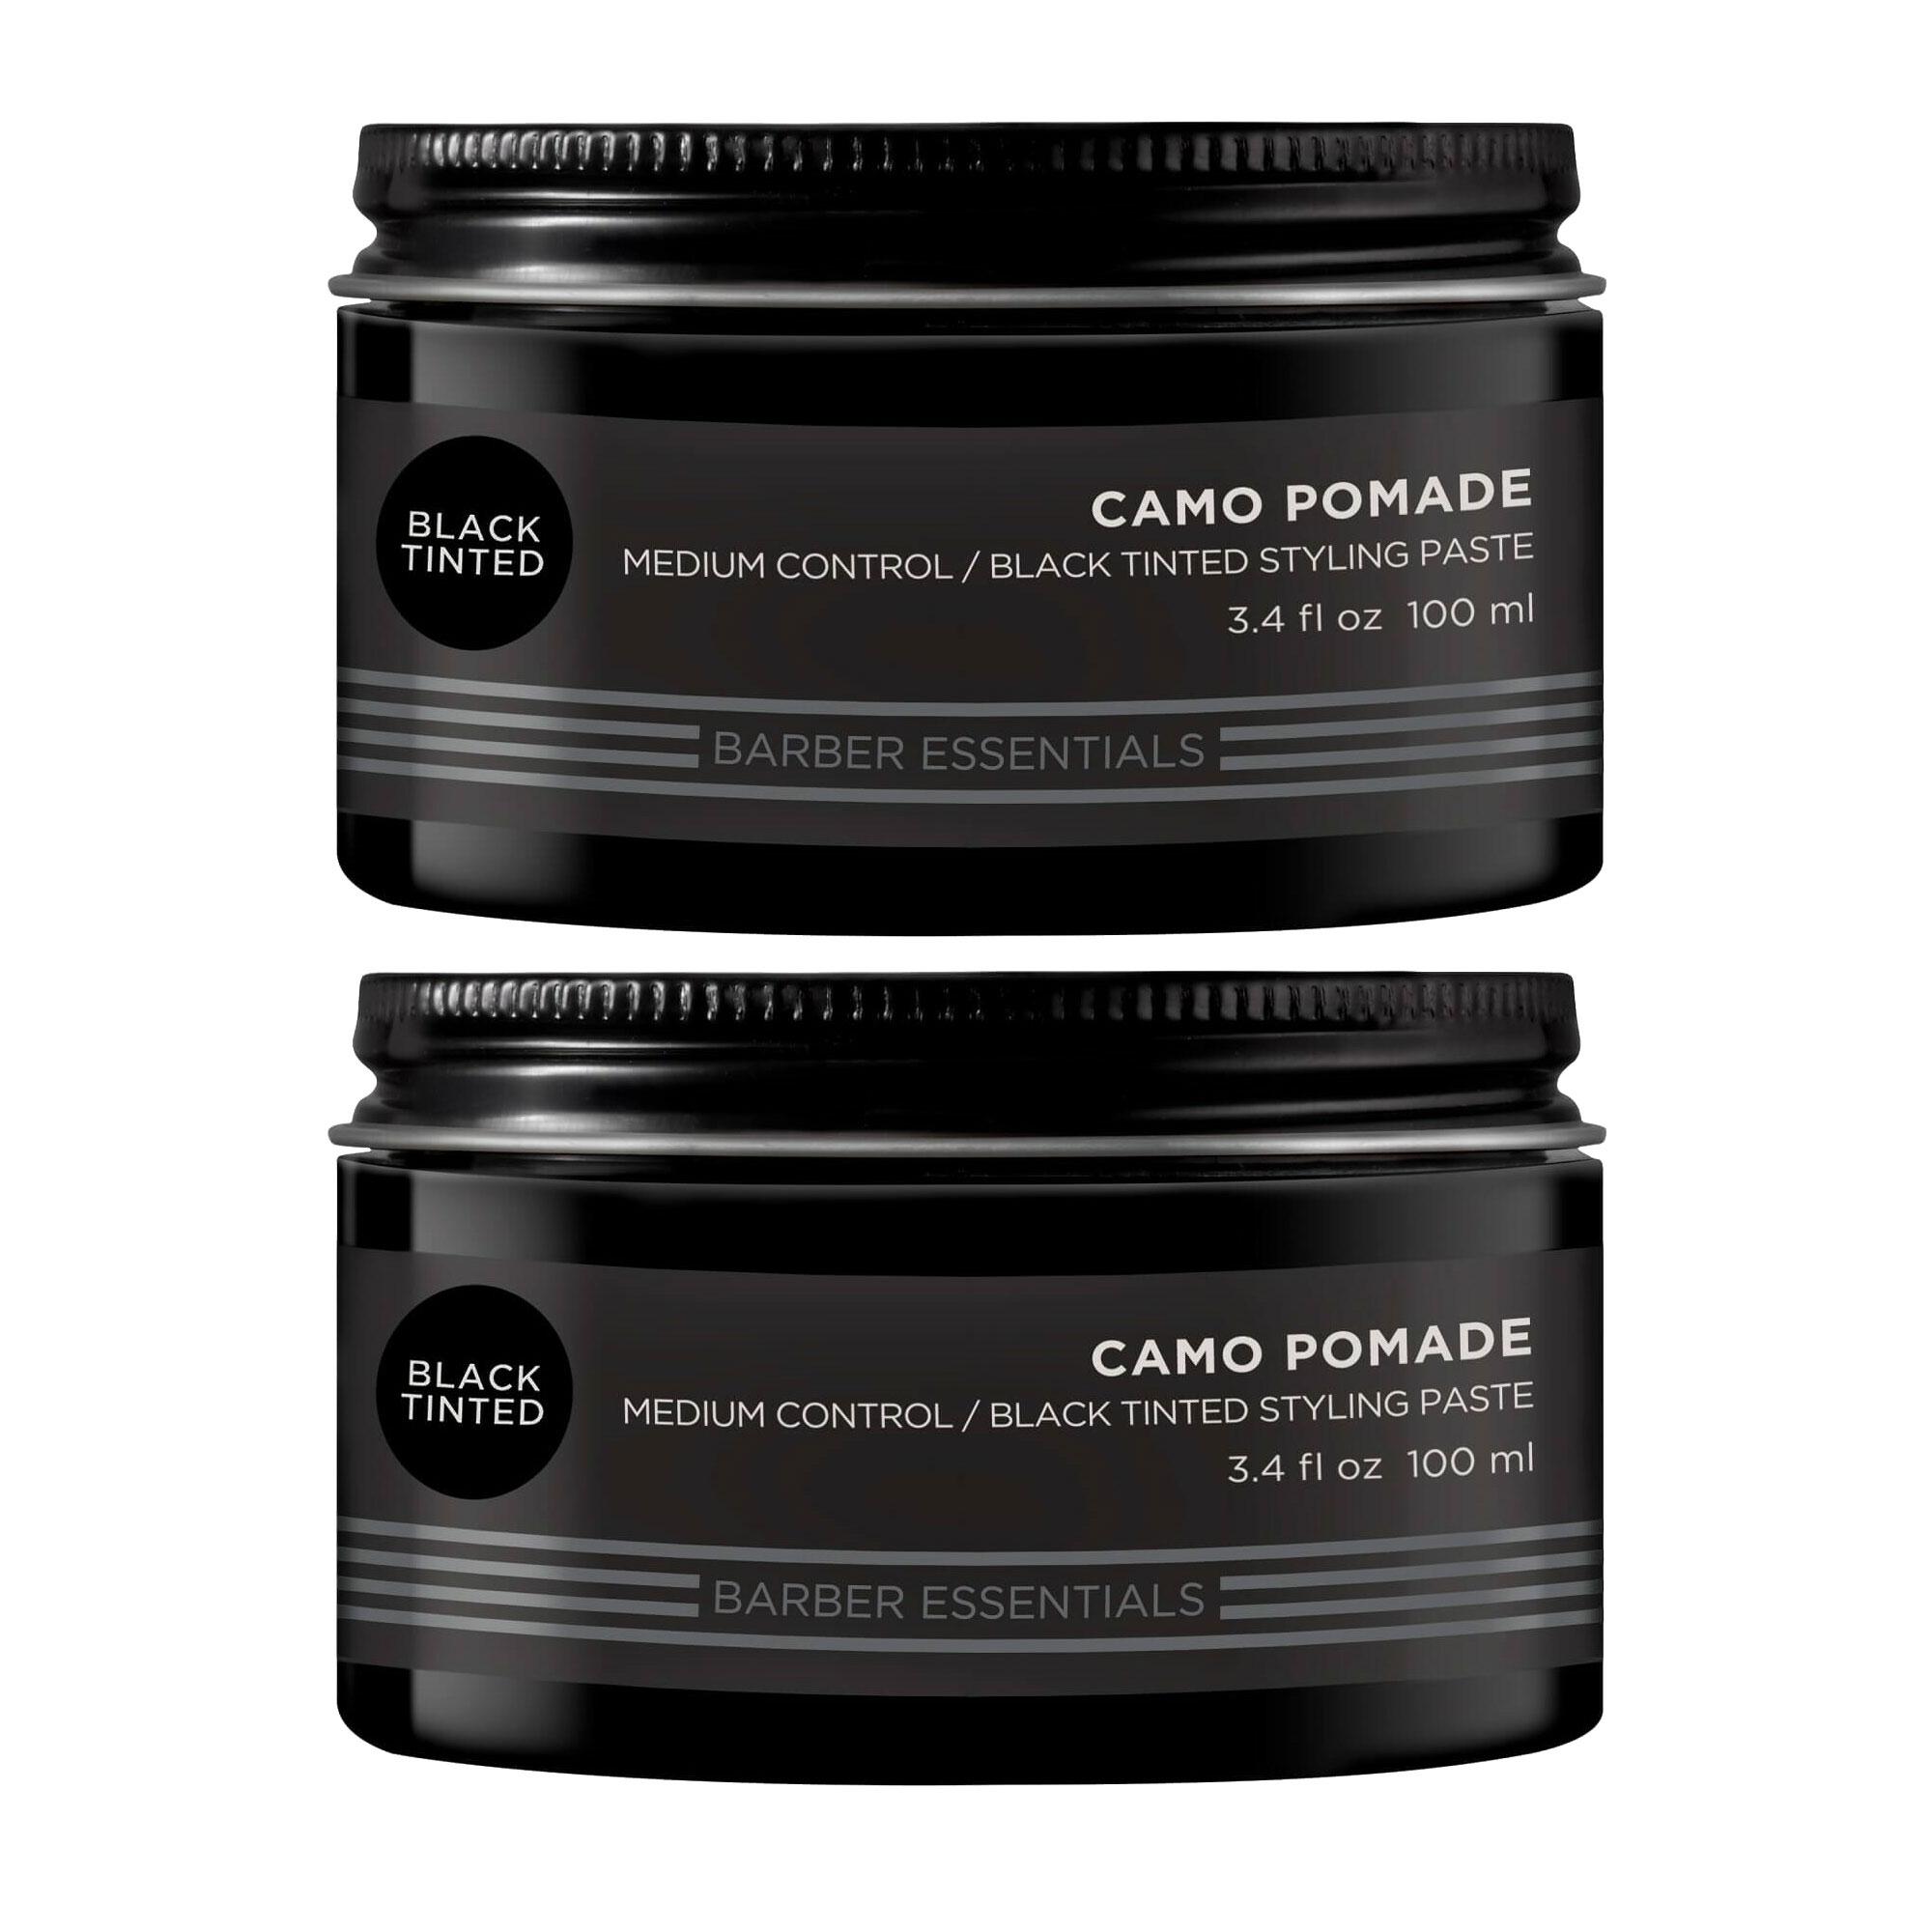 Redken Brews Camo Black Tinted Pomade 2x 100ml = 200ml